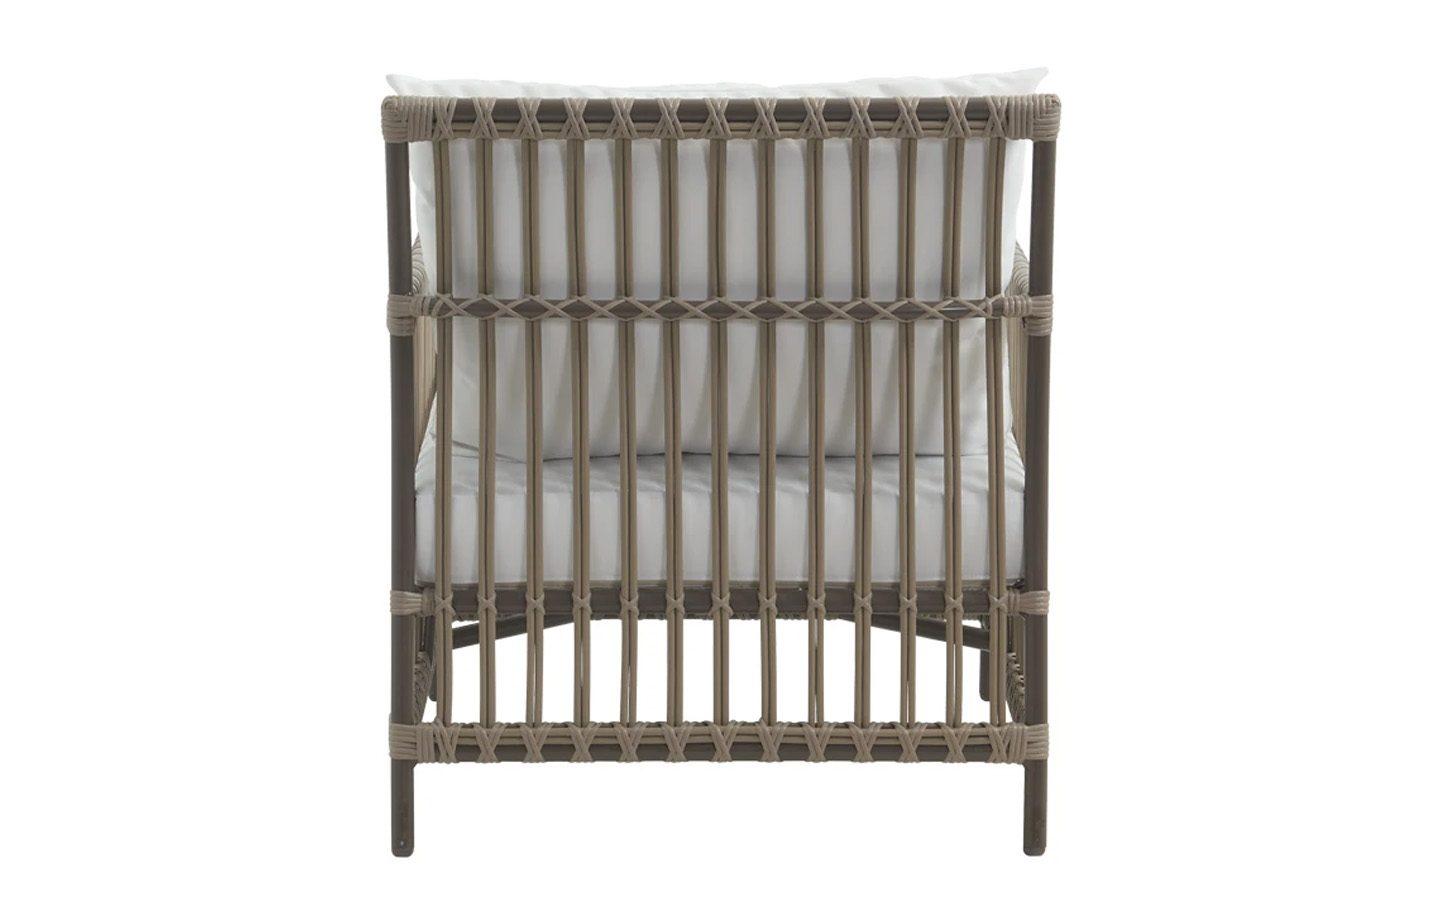 Caroline-Exterior-Lounge-Chair-Moccachino-03